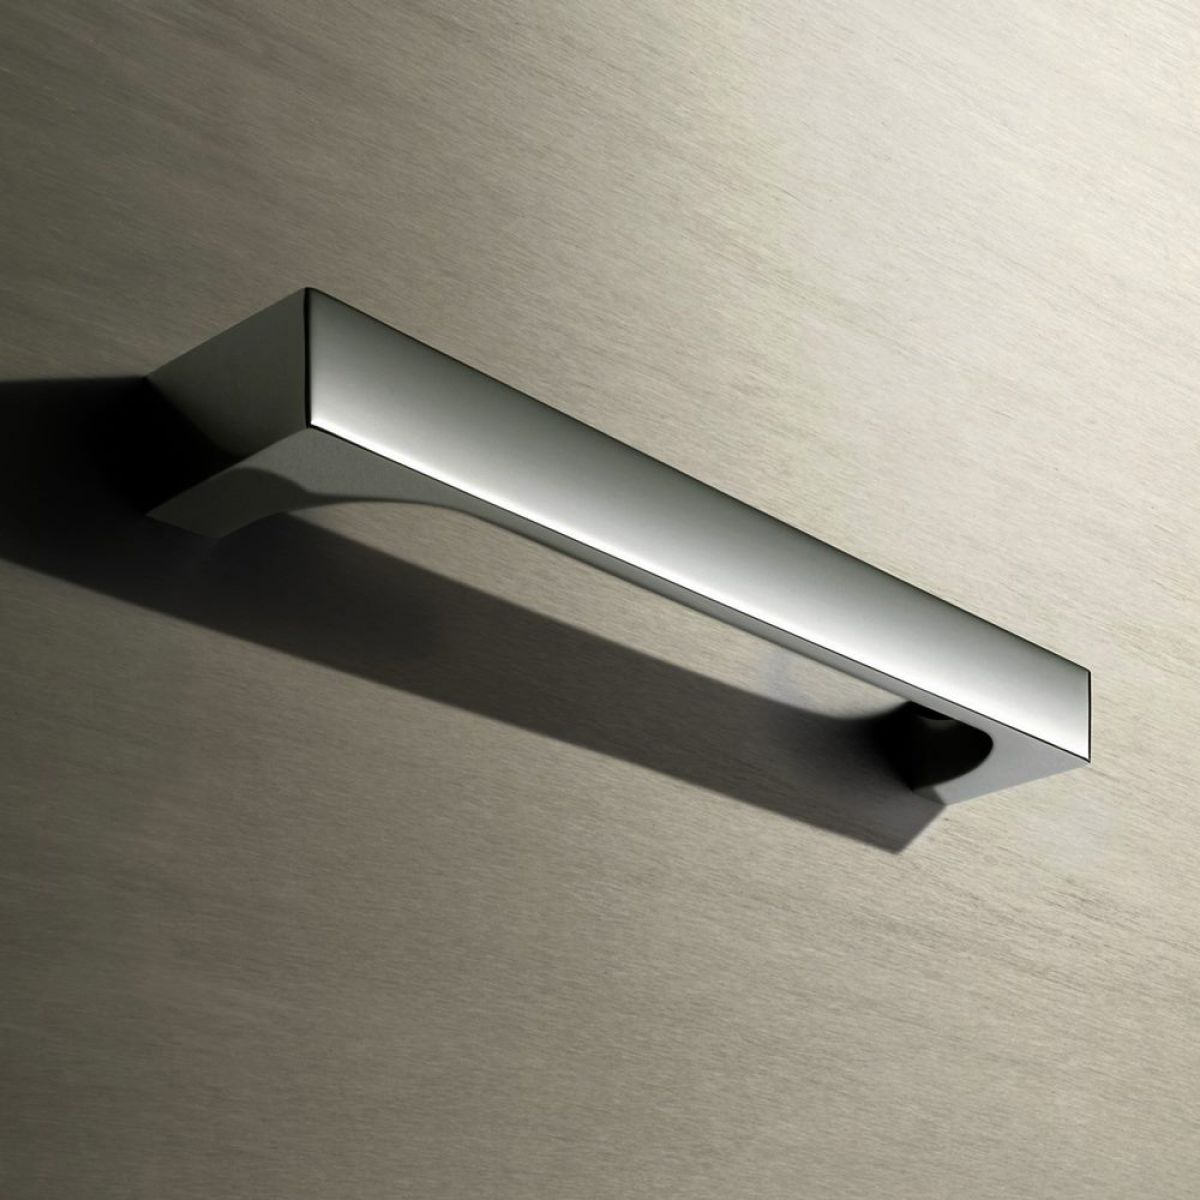 keuco edition 11 grab bar uk bathrooms. Black Bedroom Furniture Sets. Home Design Ideas